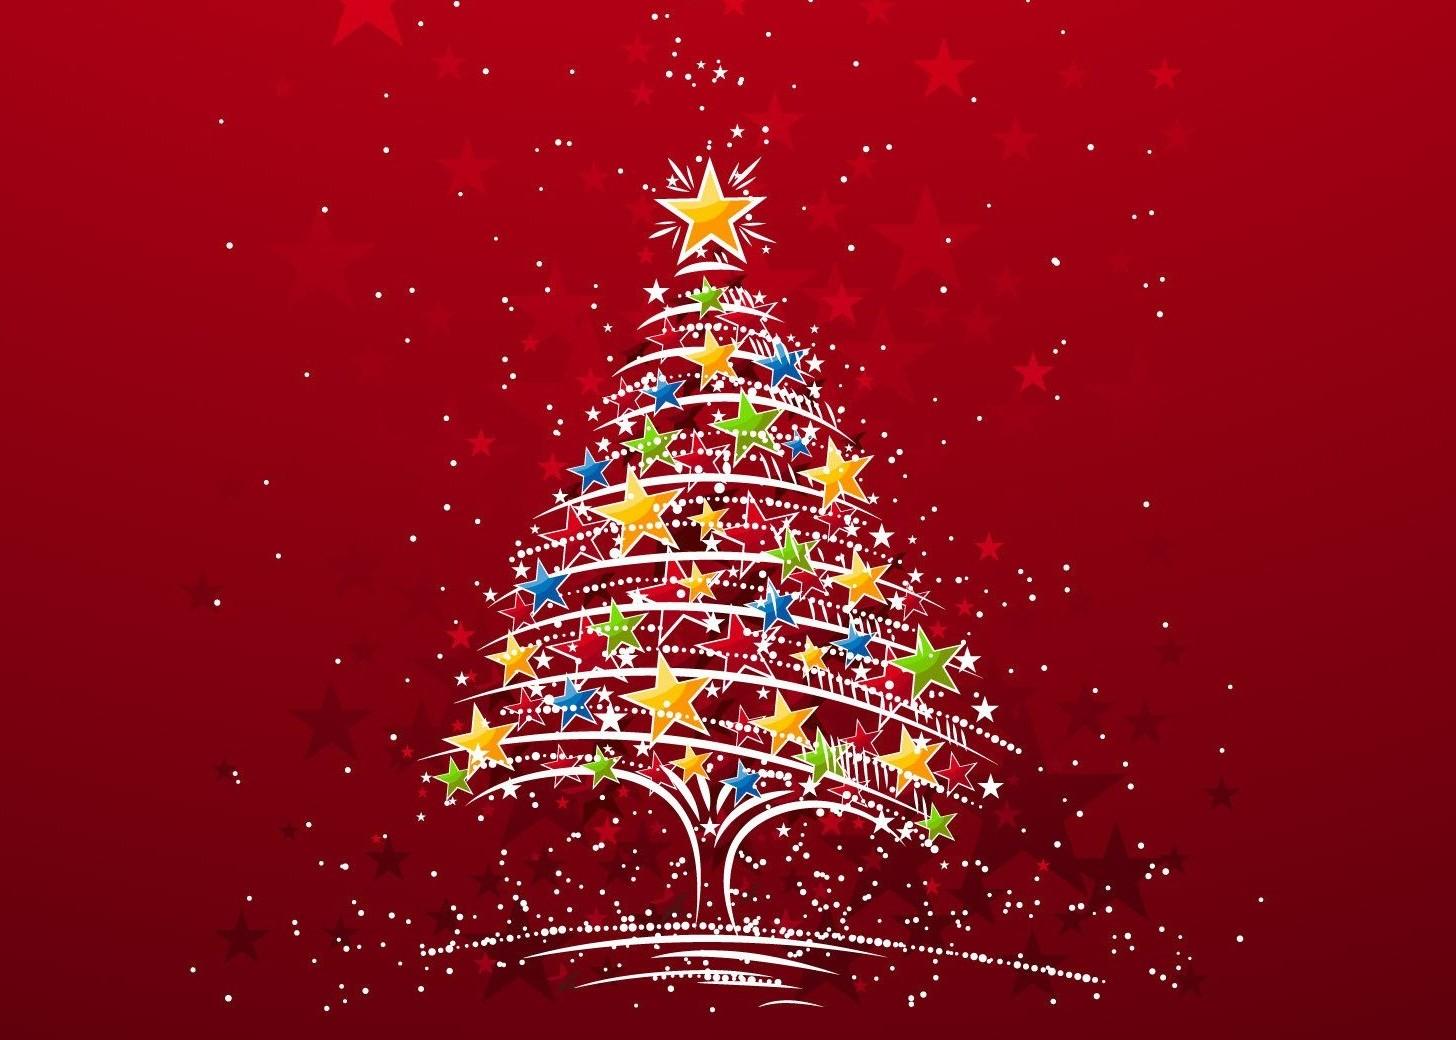 merry_christmas_wallpaper_de816[1]